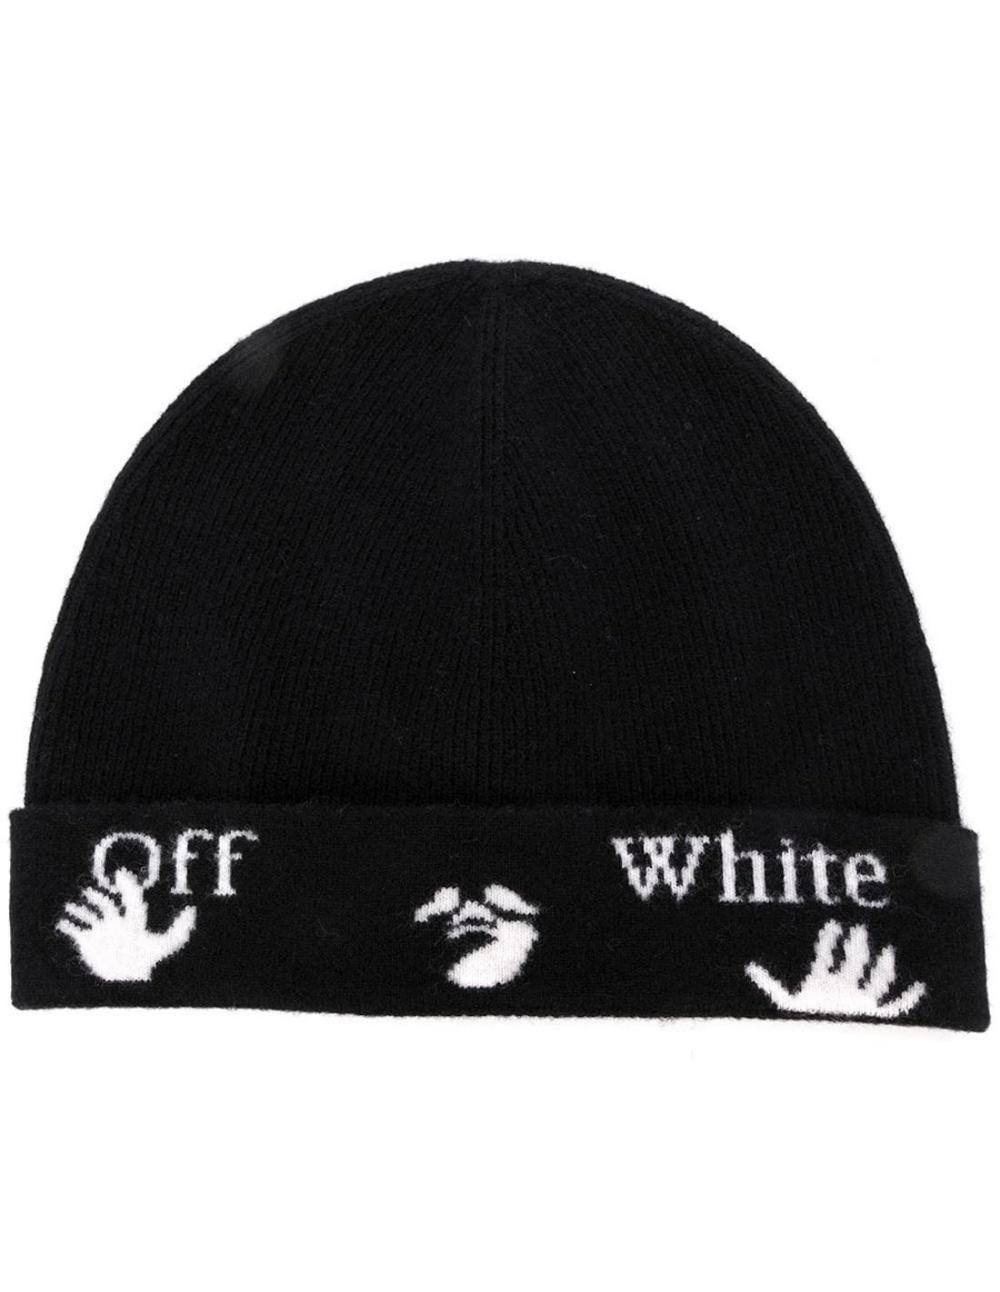 Off White Black New Logo Beanie Unisex Fall Winter 2020 Wool Beanie Beanie Hats Off White